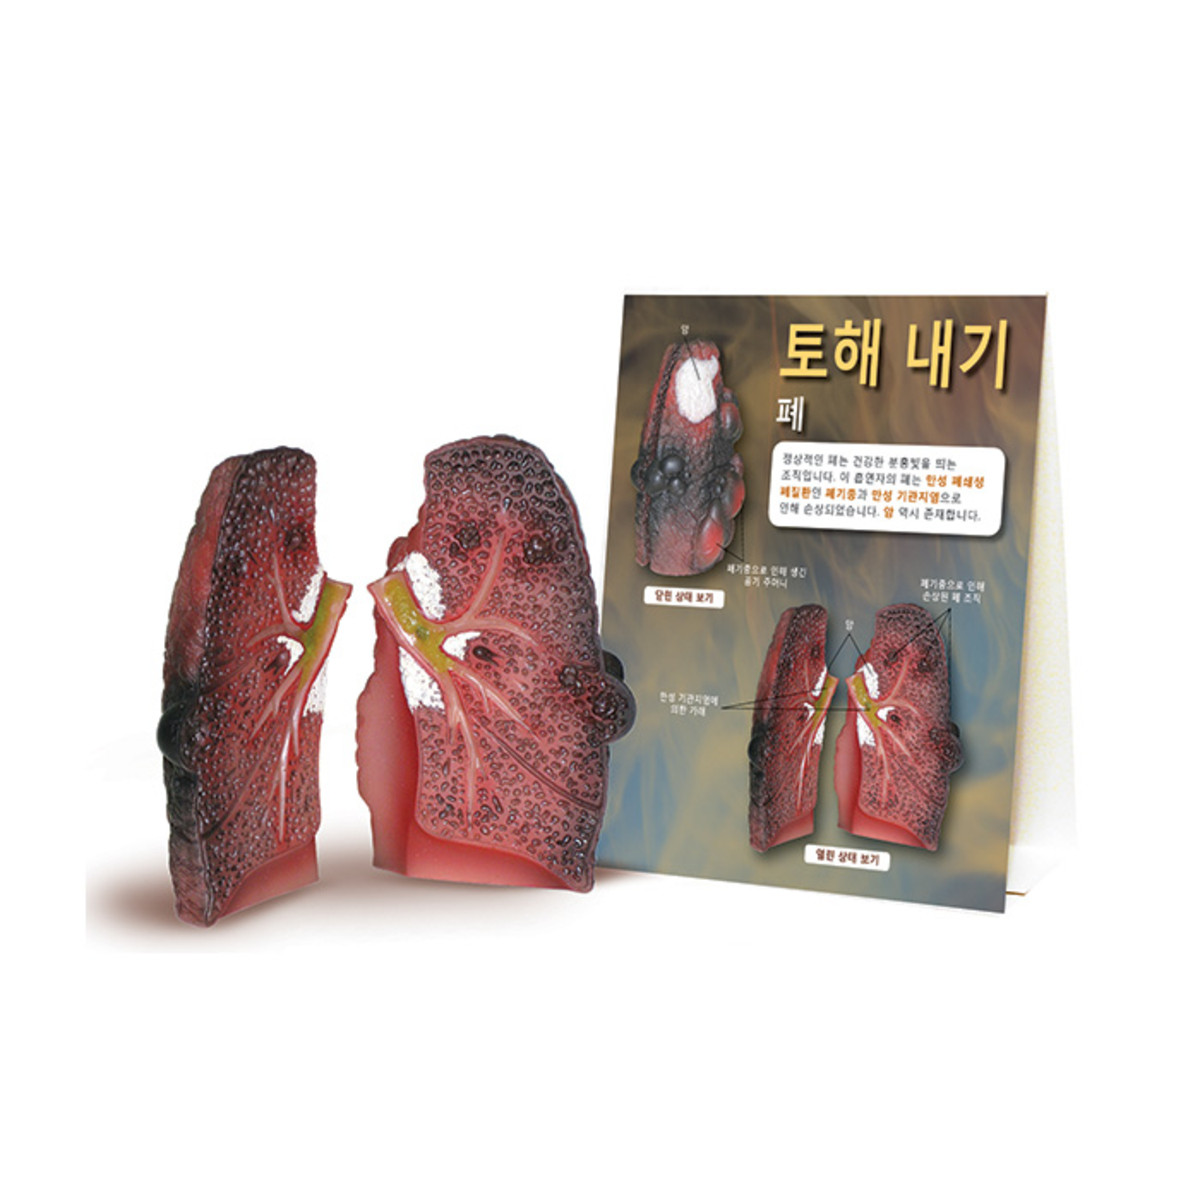 Health Edco; Korean; health education products; tobacco; cancer; smoking cessation; pulmonary disease; chronic; lung damage